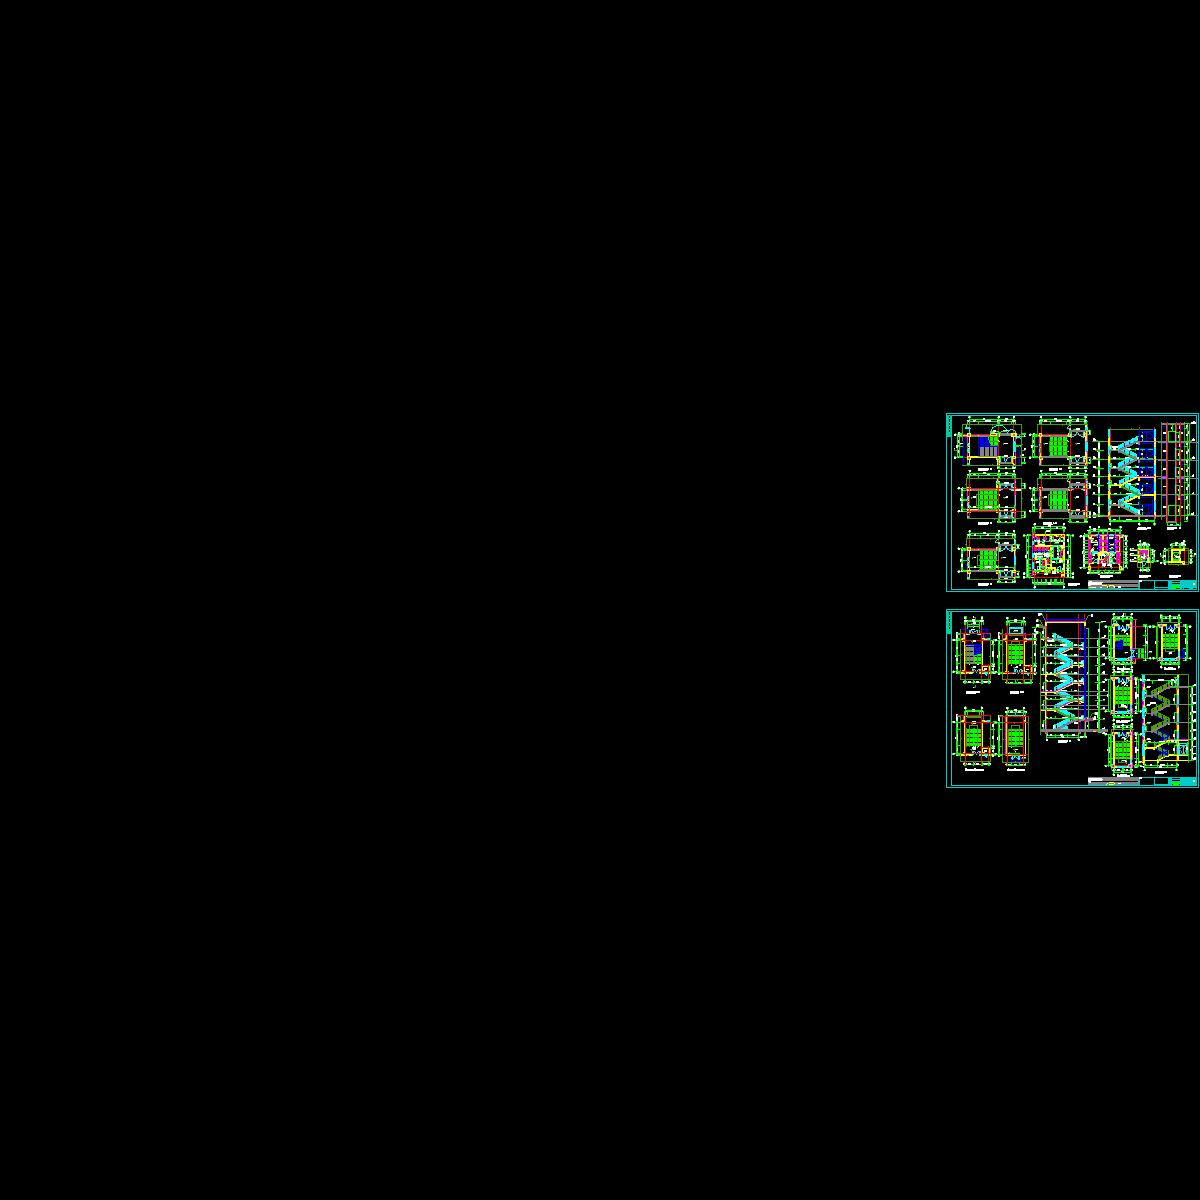 js-012~013楼梯、电梯、卫生间放大图_t3.dwg